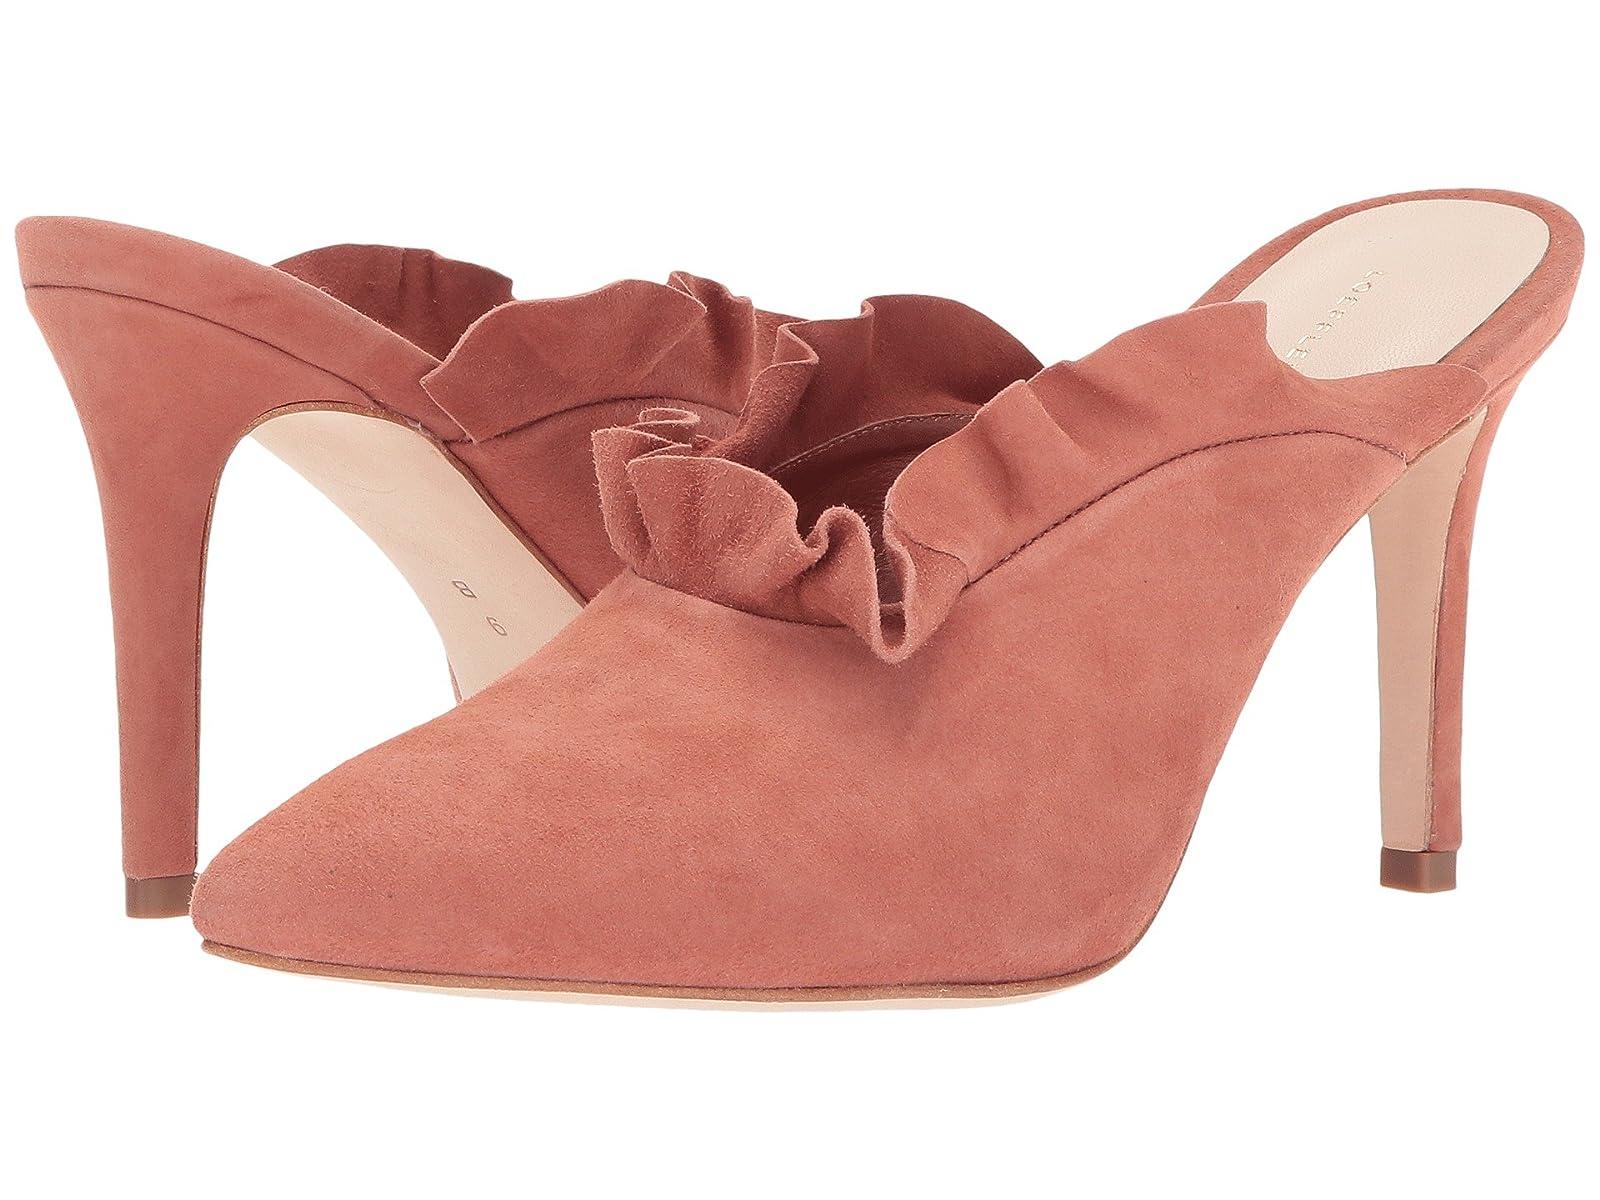 Loeffler Randall LangleyCheap and distinctive eye-catching shoes